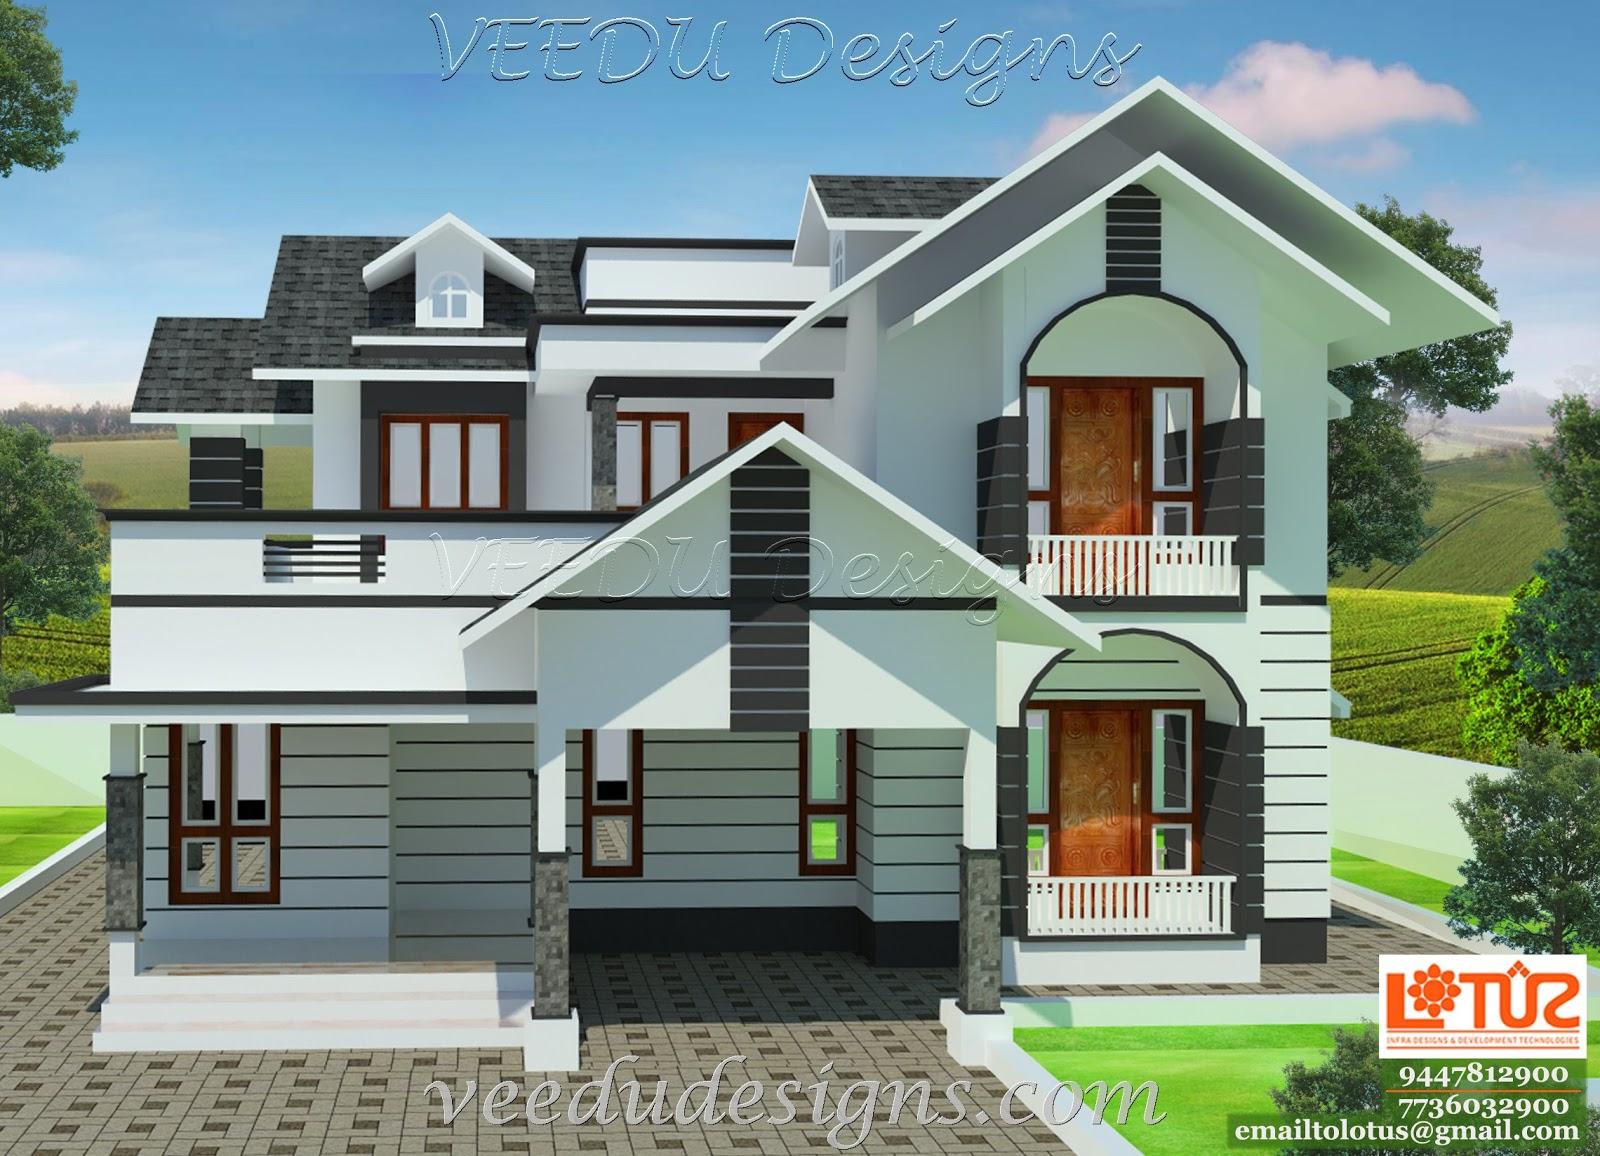 House compound wall design joy studio design gallery best design - Elevation Of Kerala House Joy Studio Design Gallery Best Design